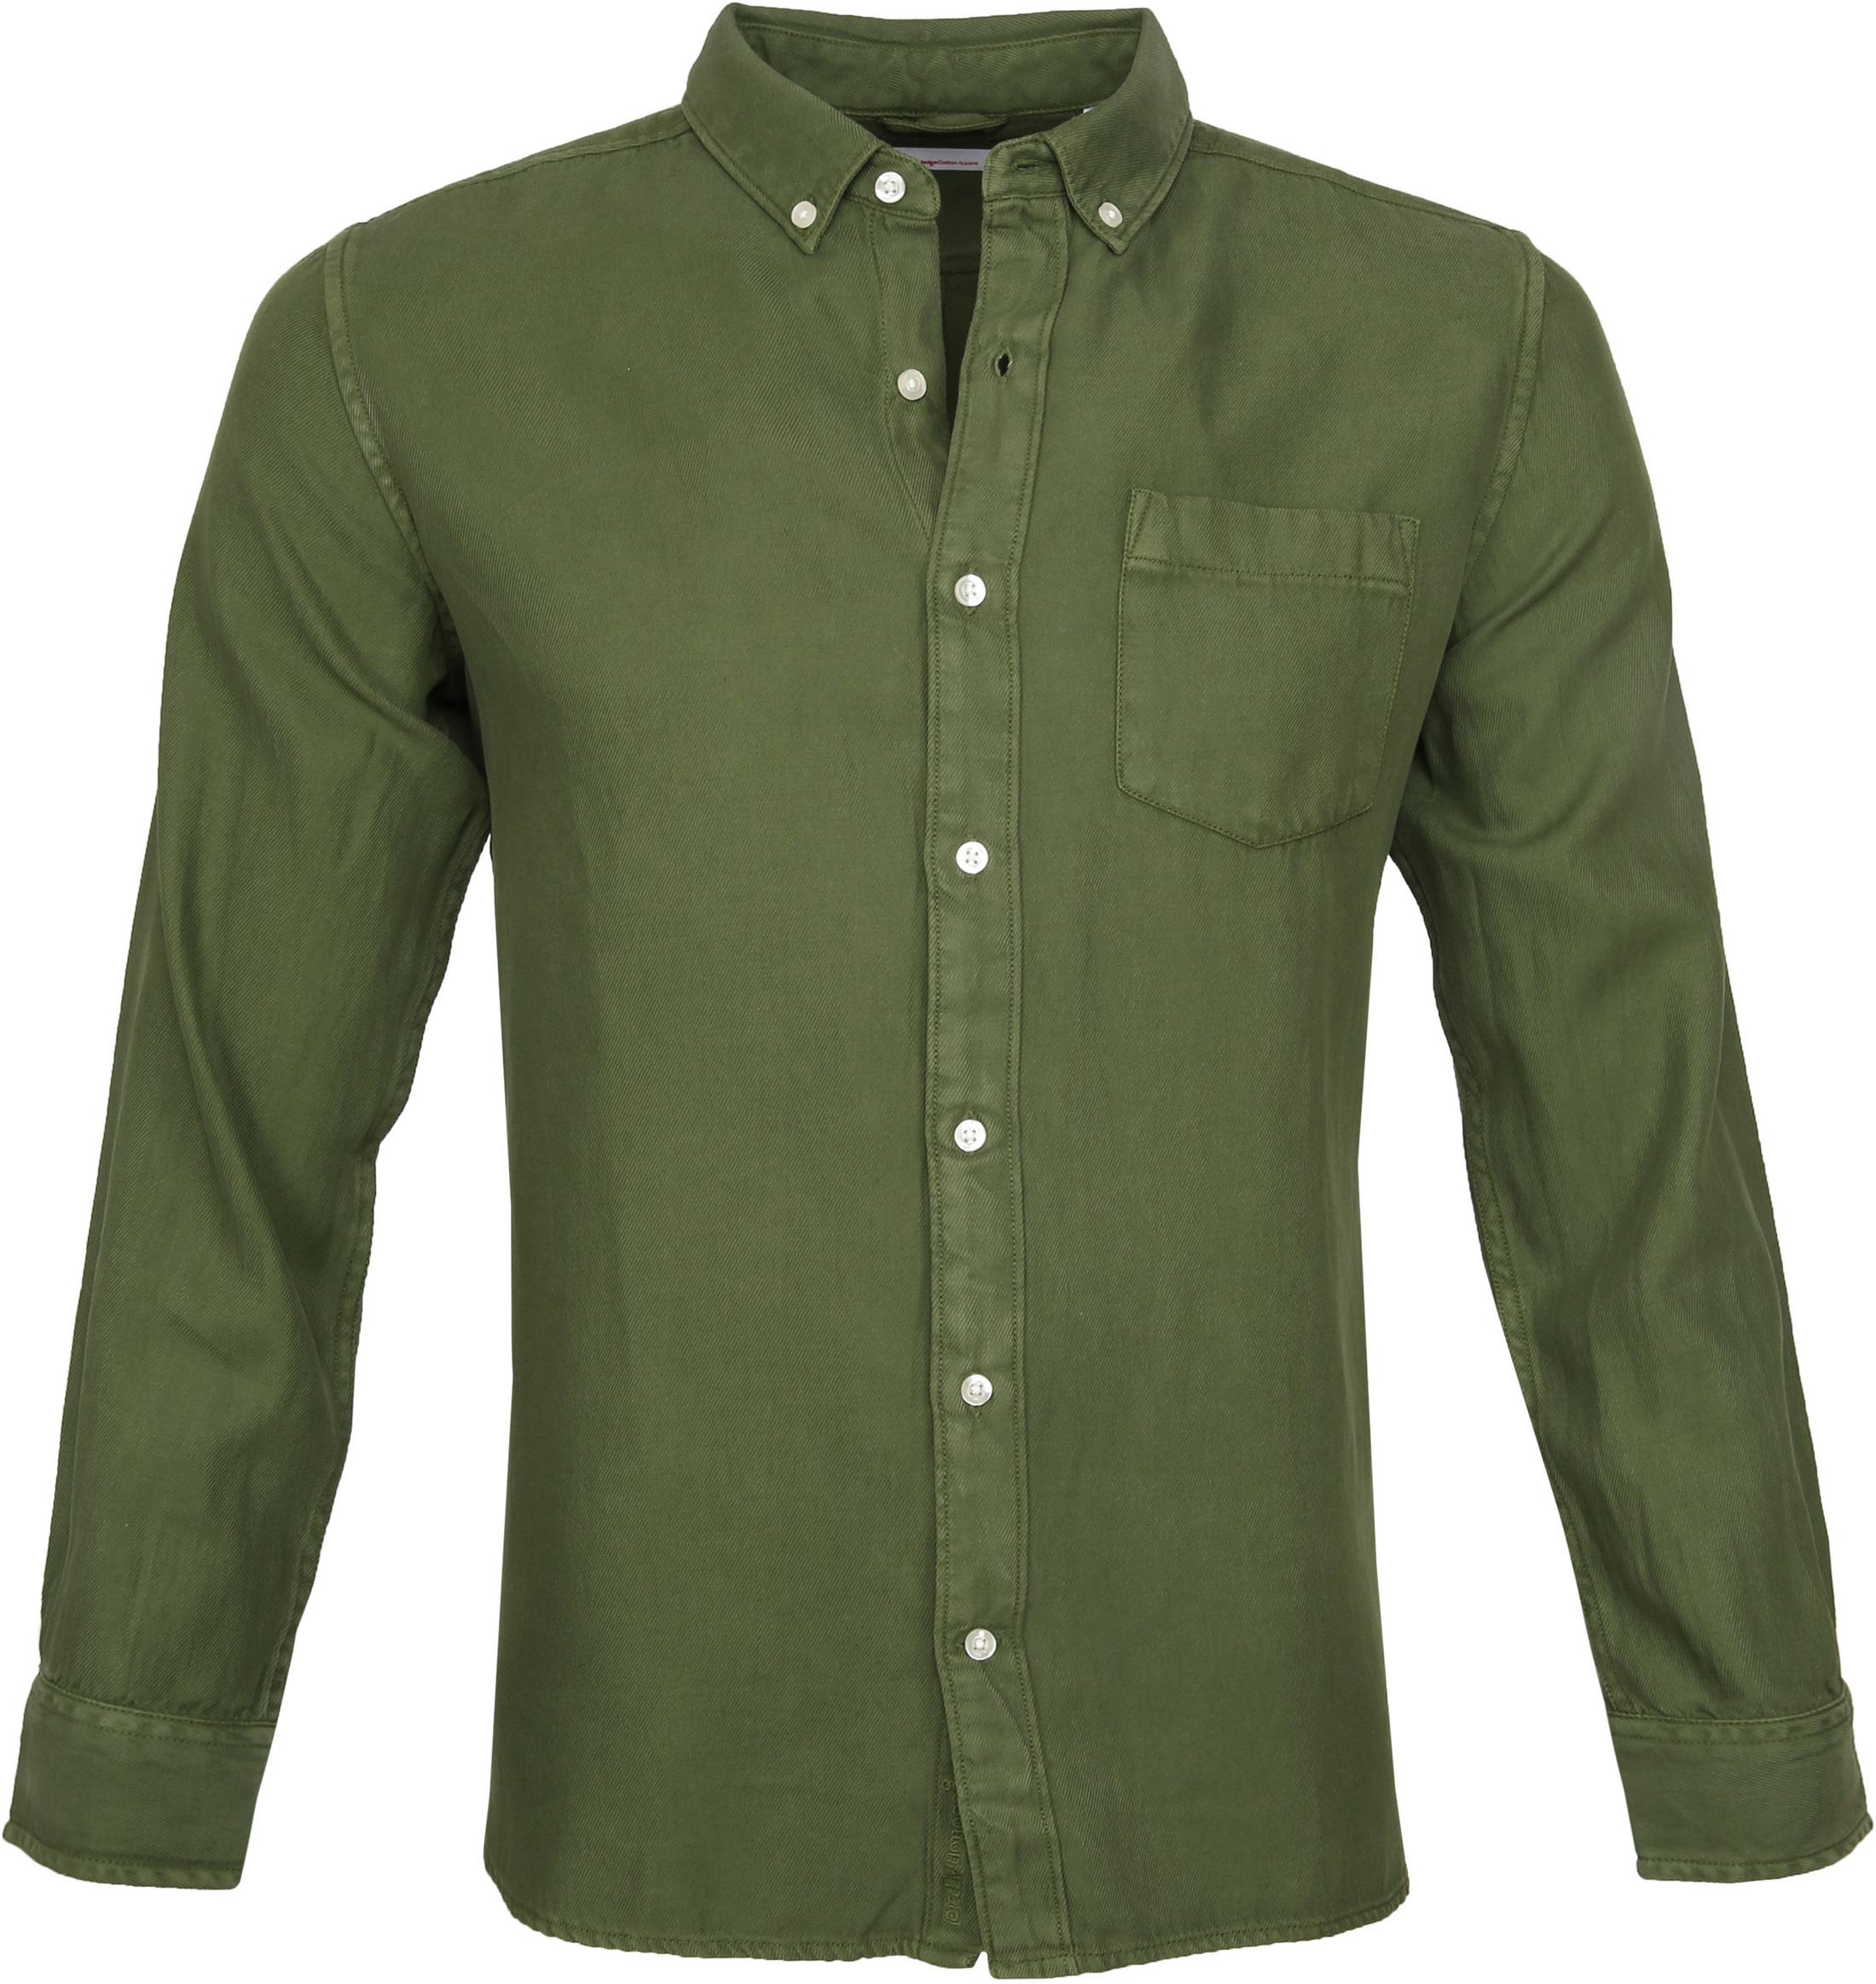 KnowledgeCotton Apparel Shirt Twill Green photo 0